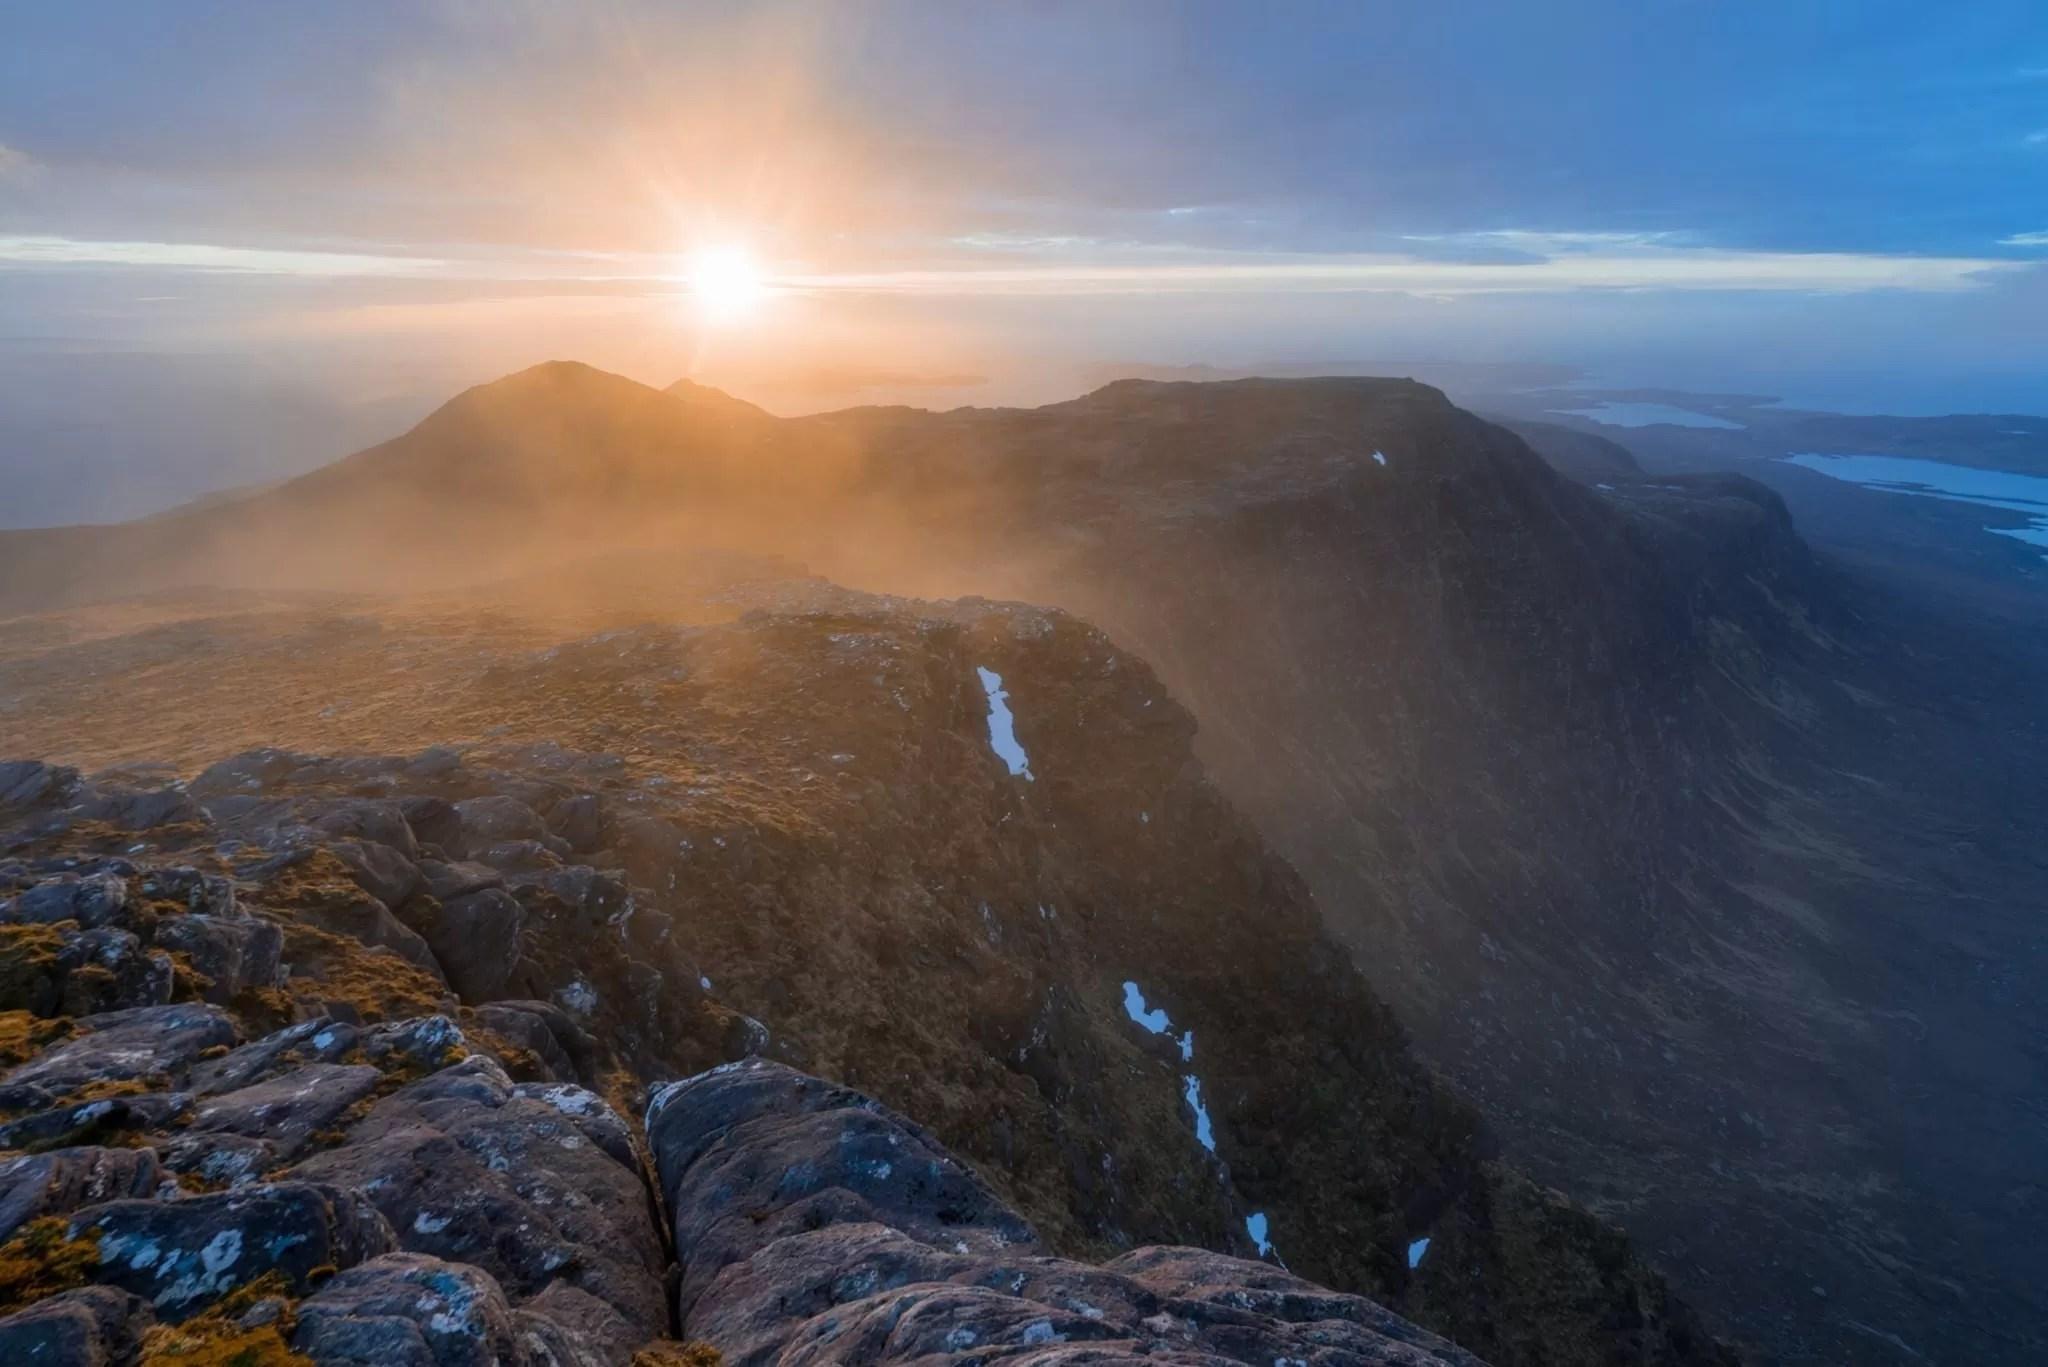 Fiddler Summit Sunset View - Scotland Wild Camping Photography Workshop